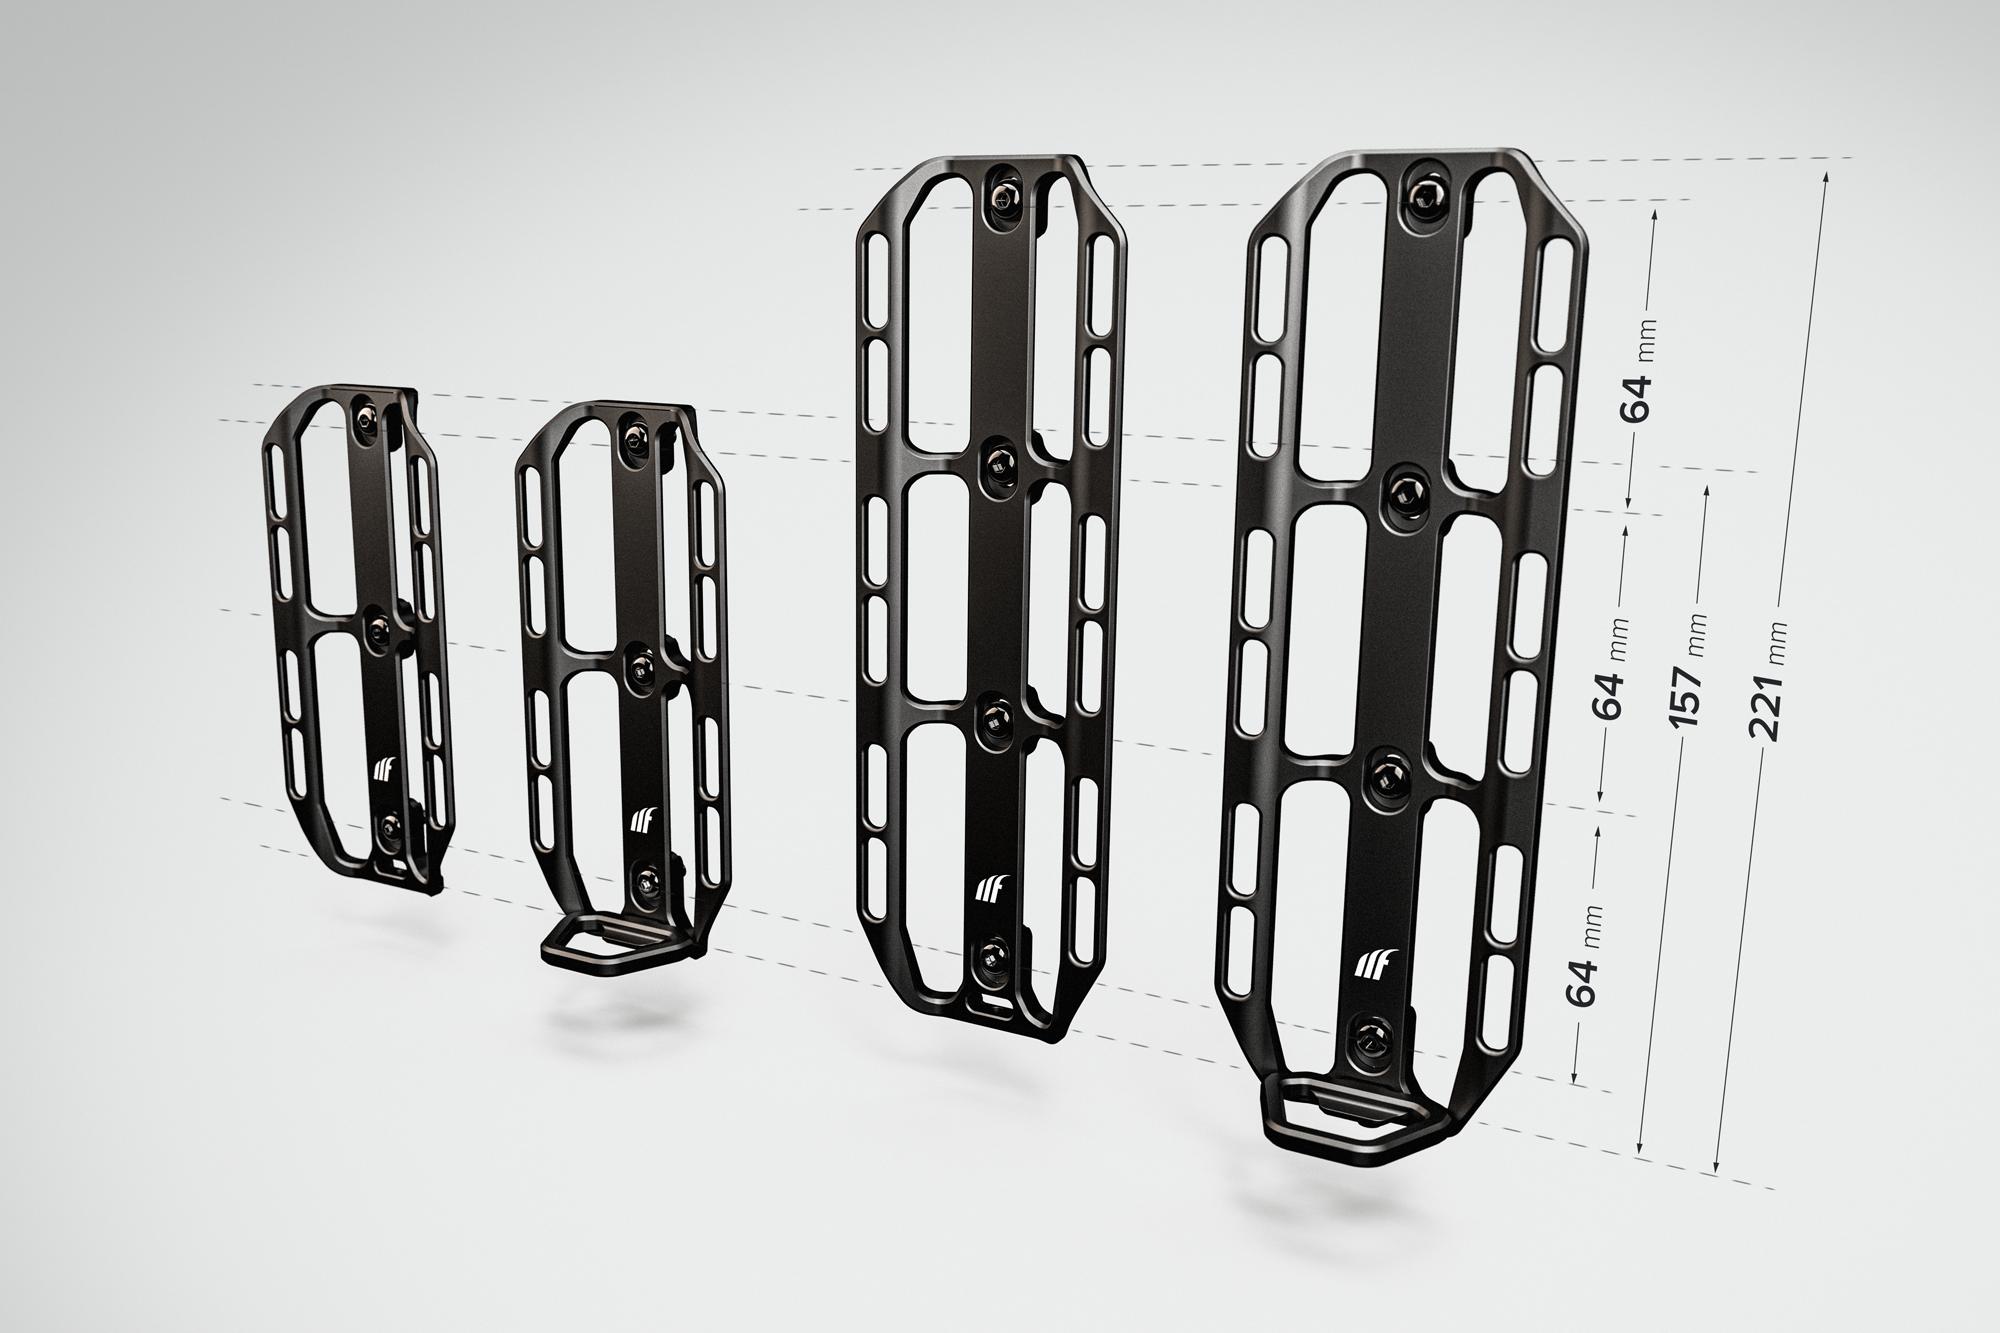 Tailfin cargo cage